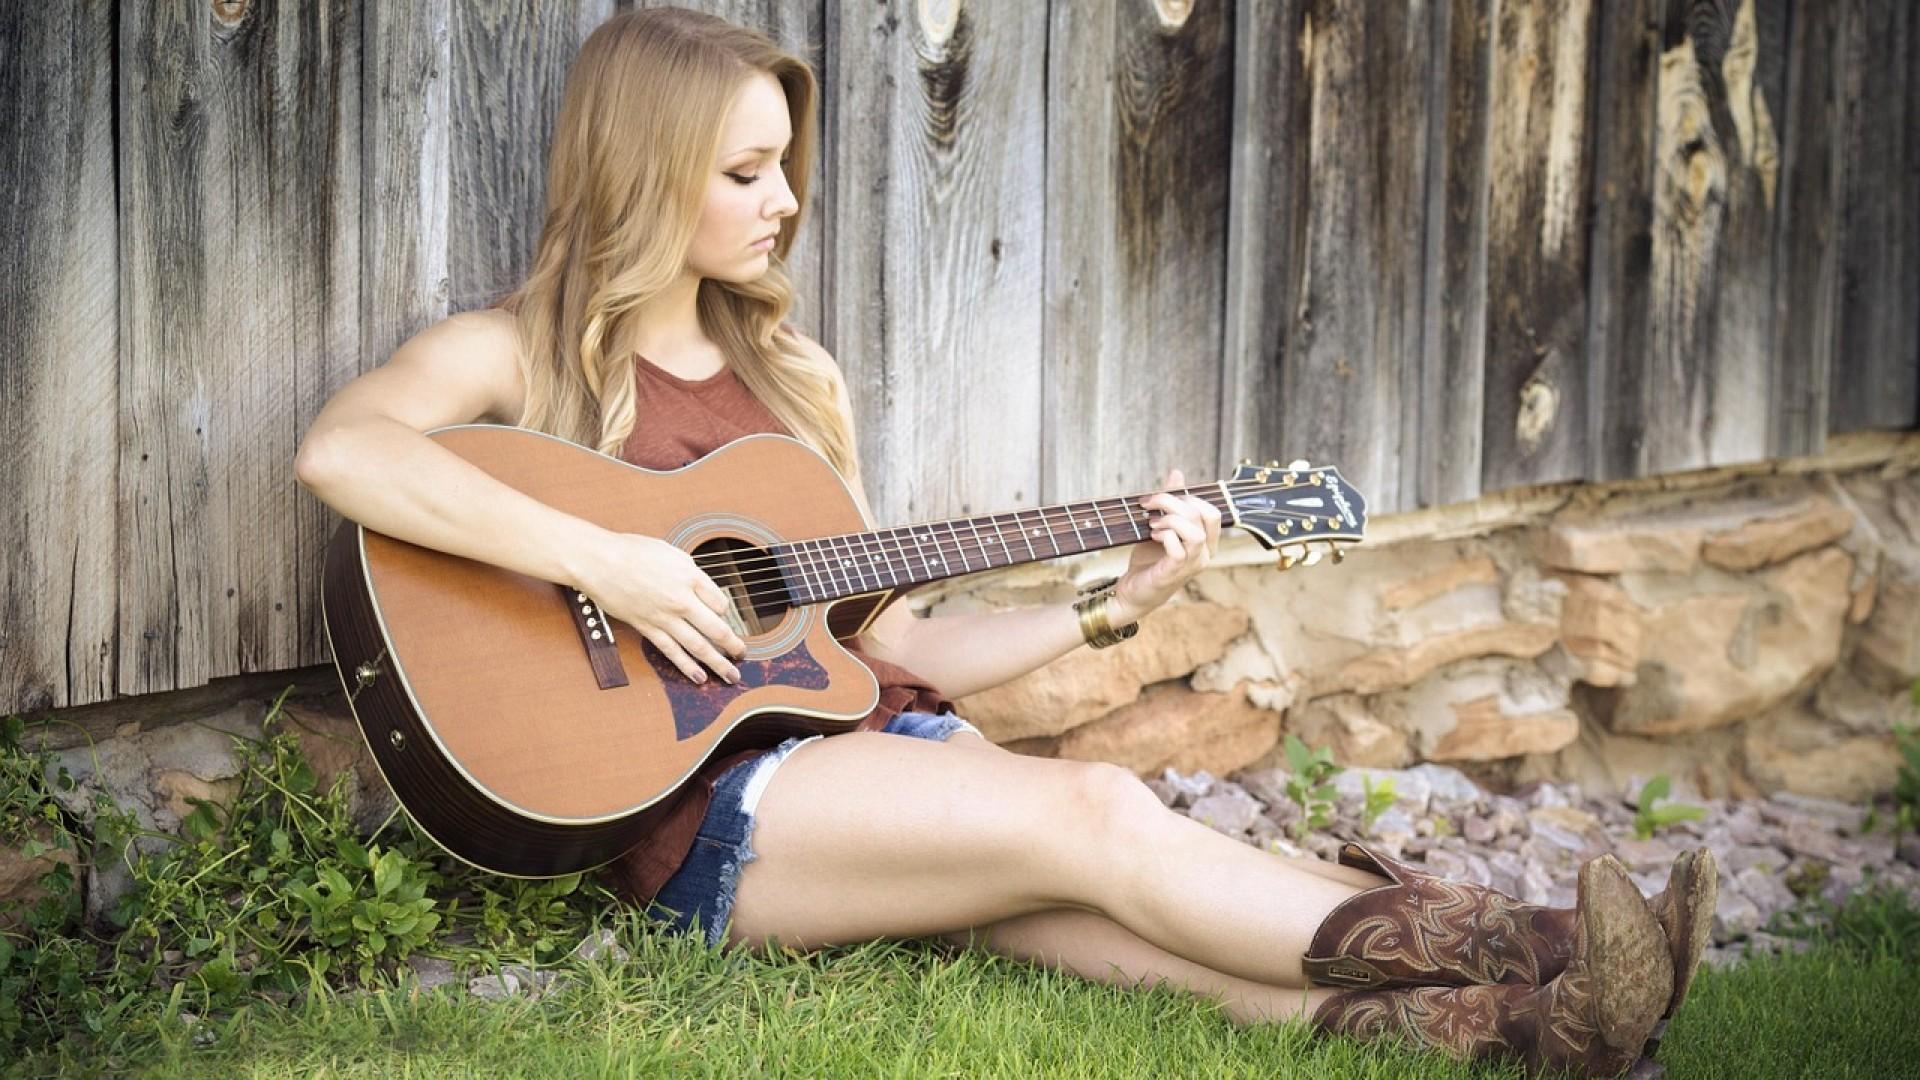 Country Girl HD Wallpaper